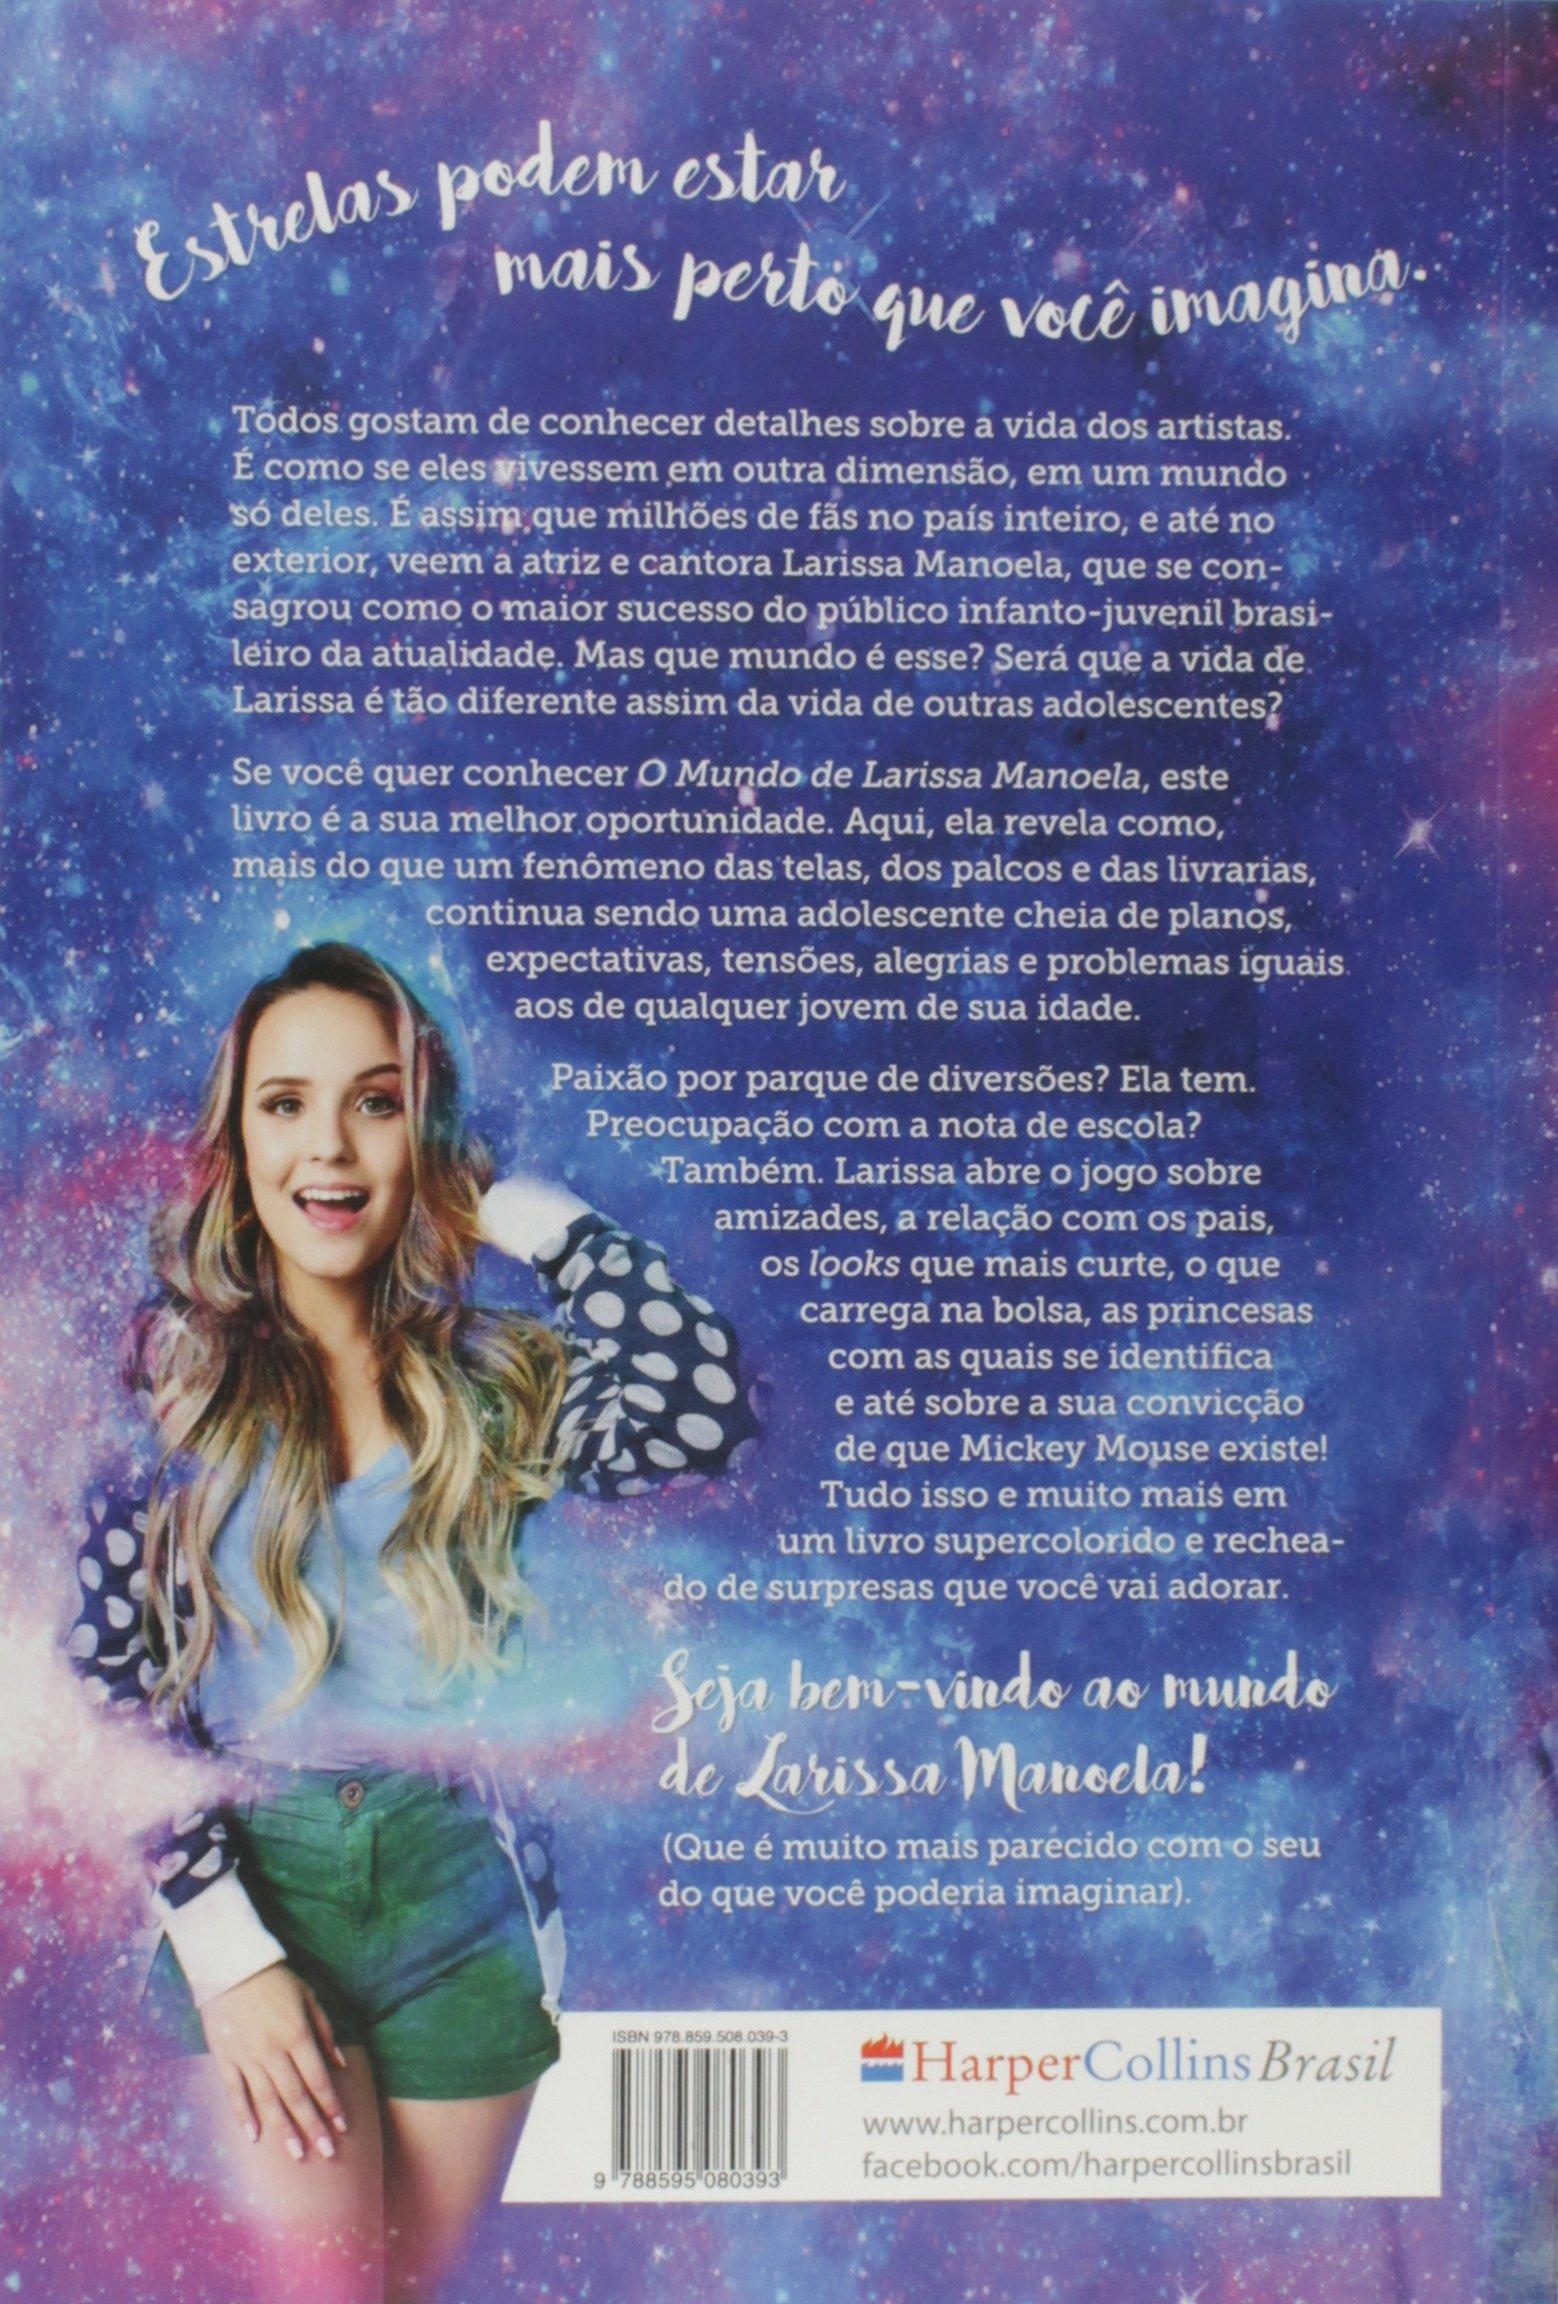 O Mundo de Larissa Manoela: Larissa Manoela: 9788595080393: Amazon.com: Books